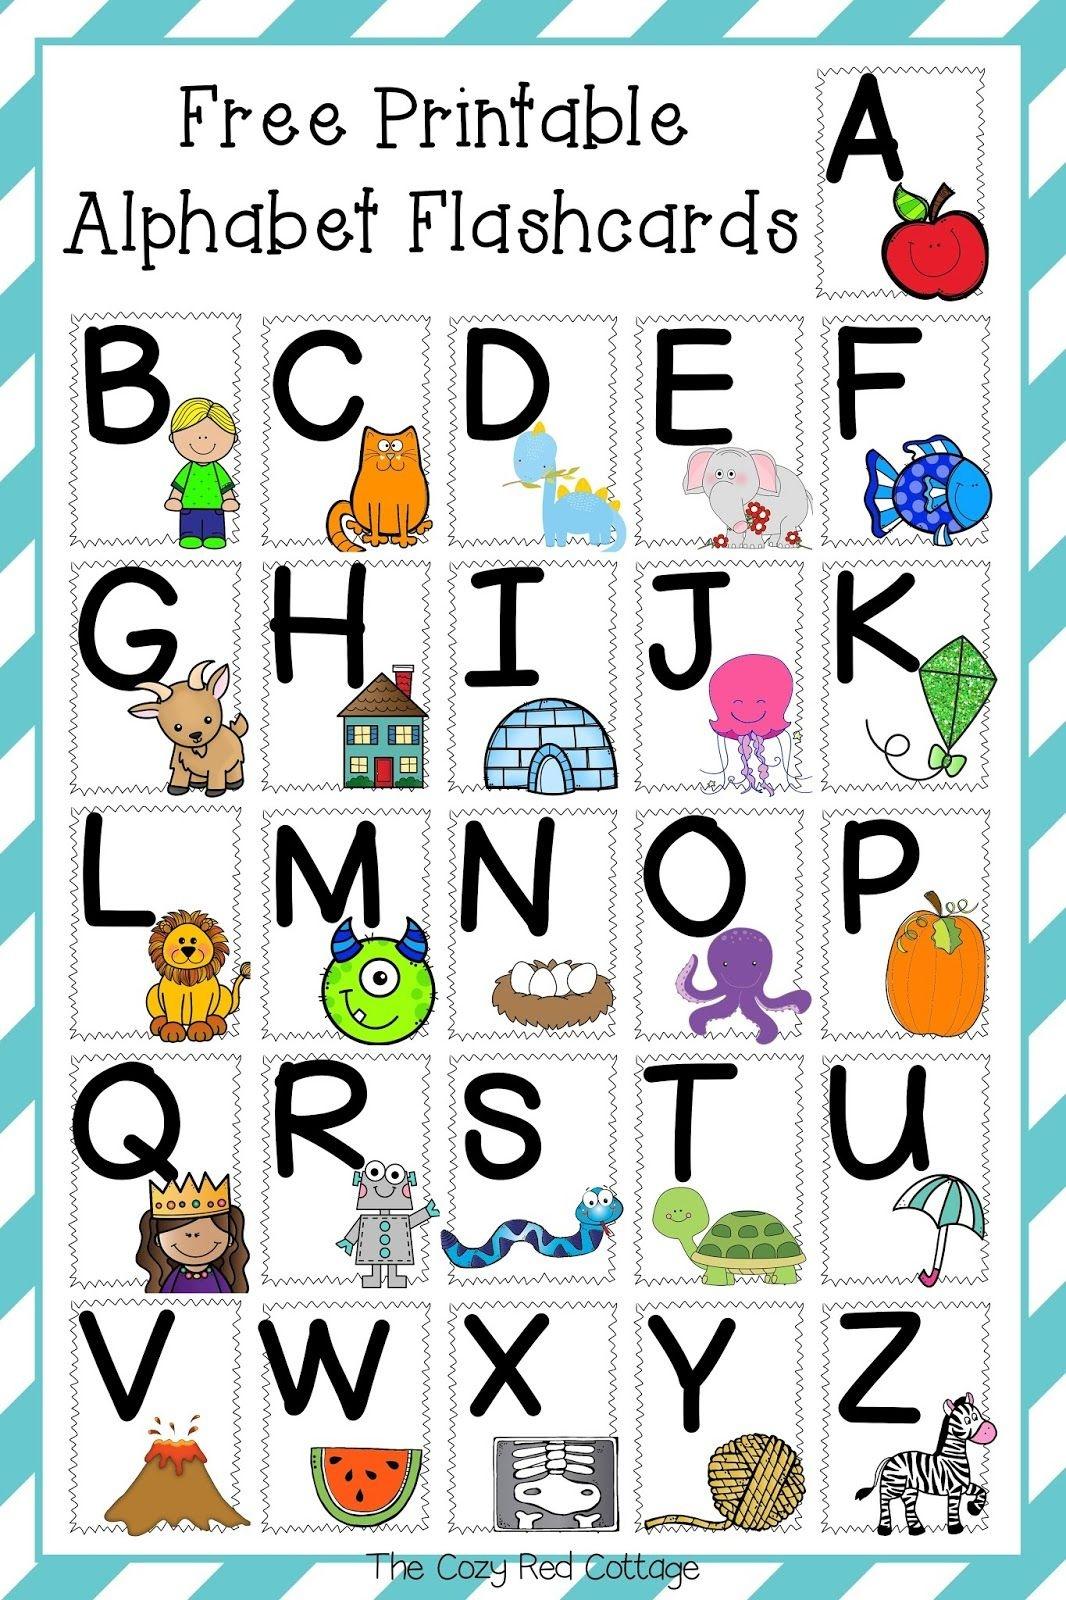 Free Printable Alphabet Flashcards | Parenting | Alphabet, Free - Free Printable Abc Flashcards